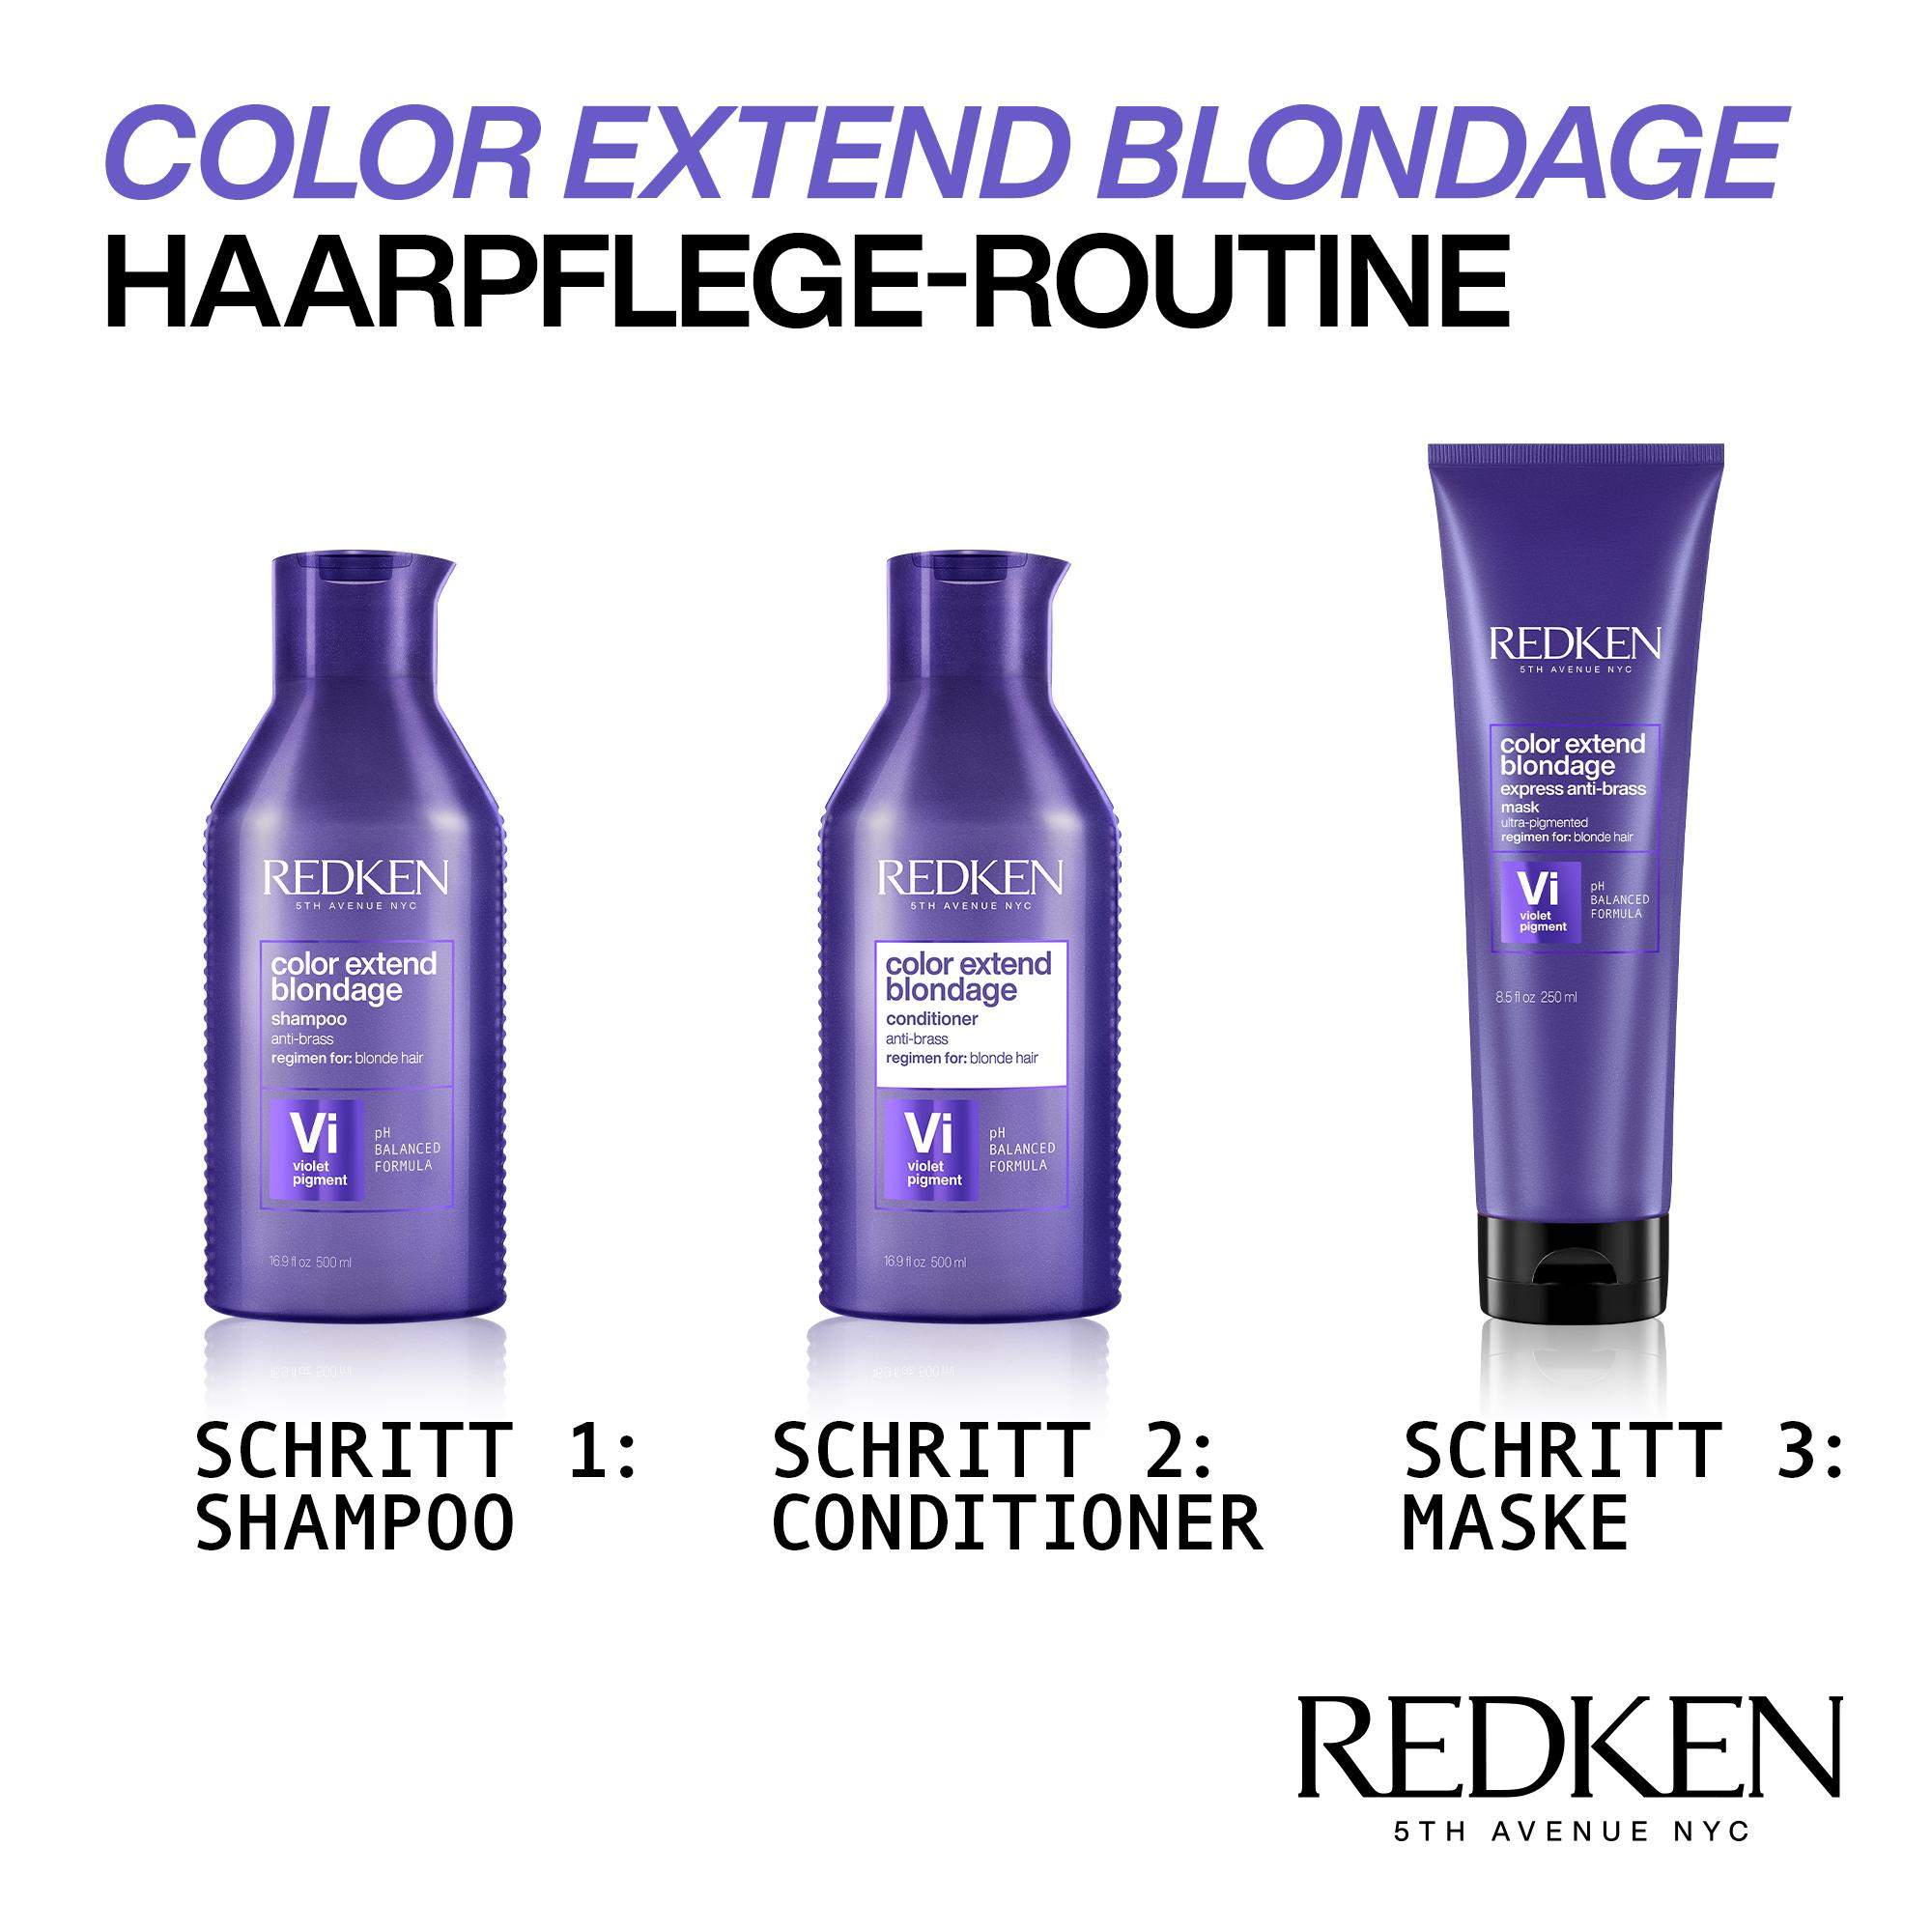 Redken Color Extend Blondage Conditioner 300ml